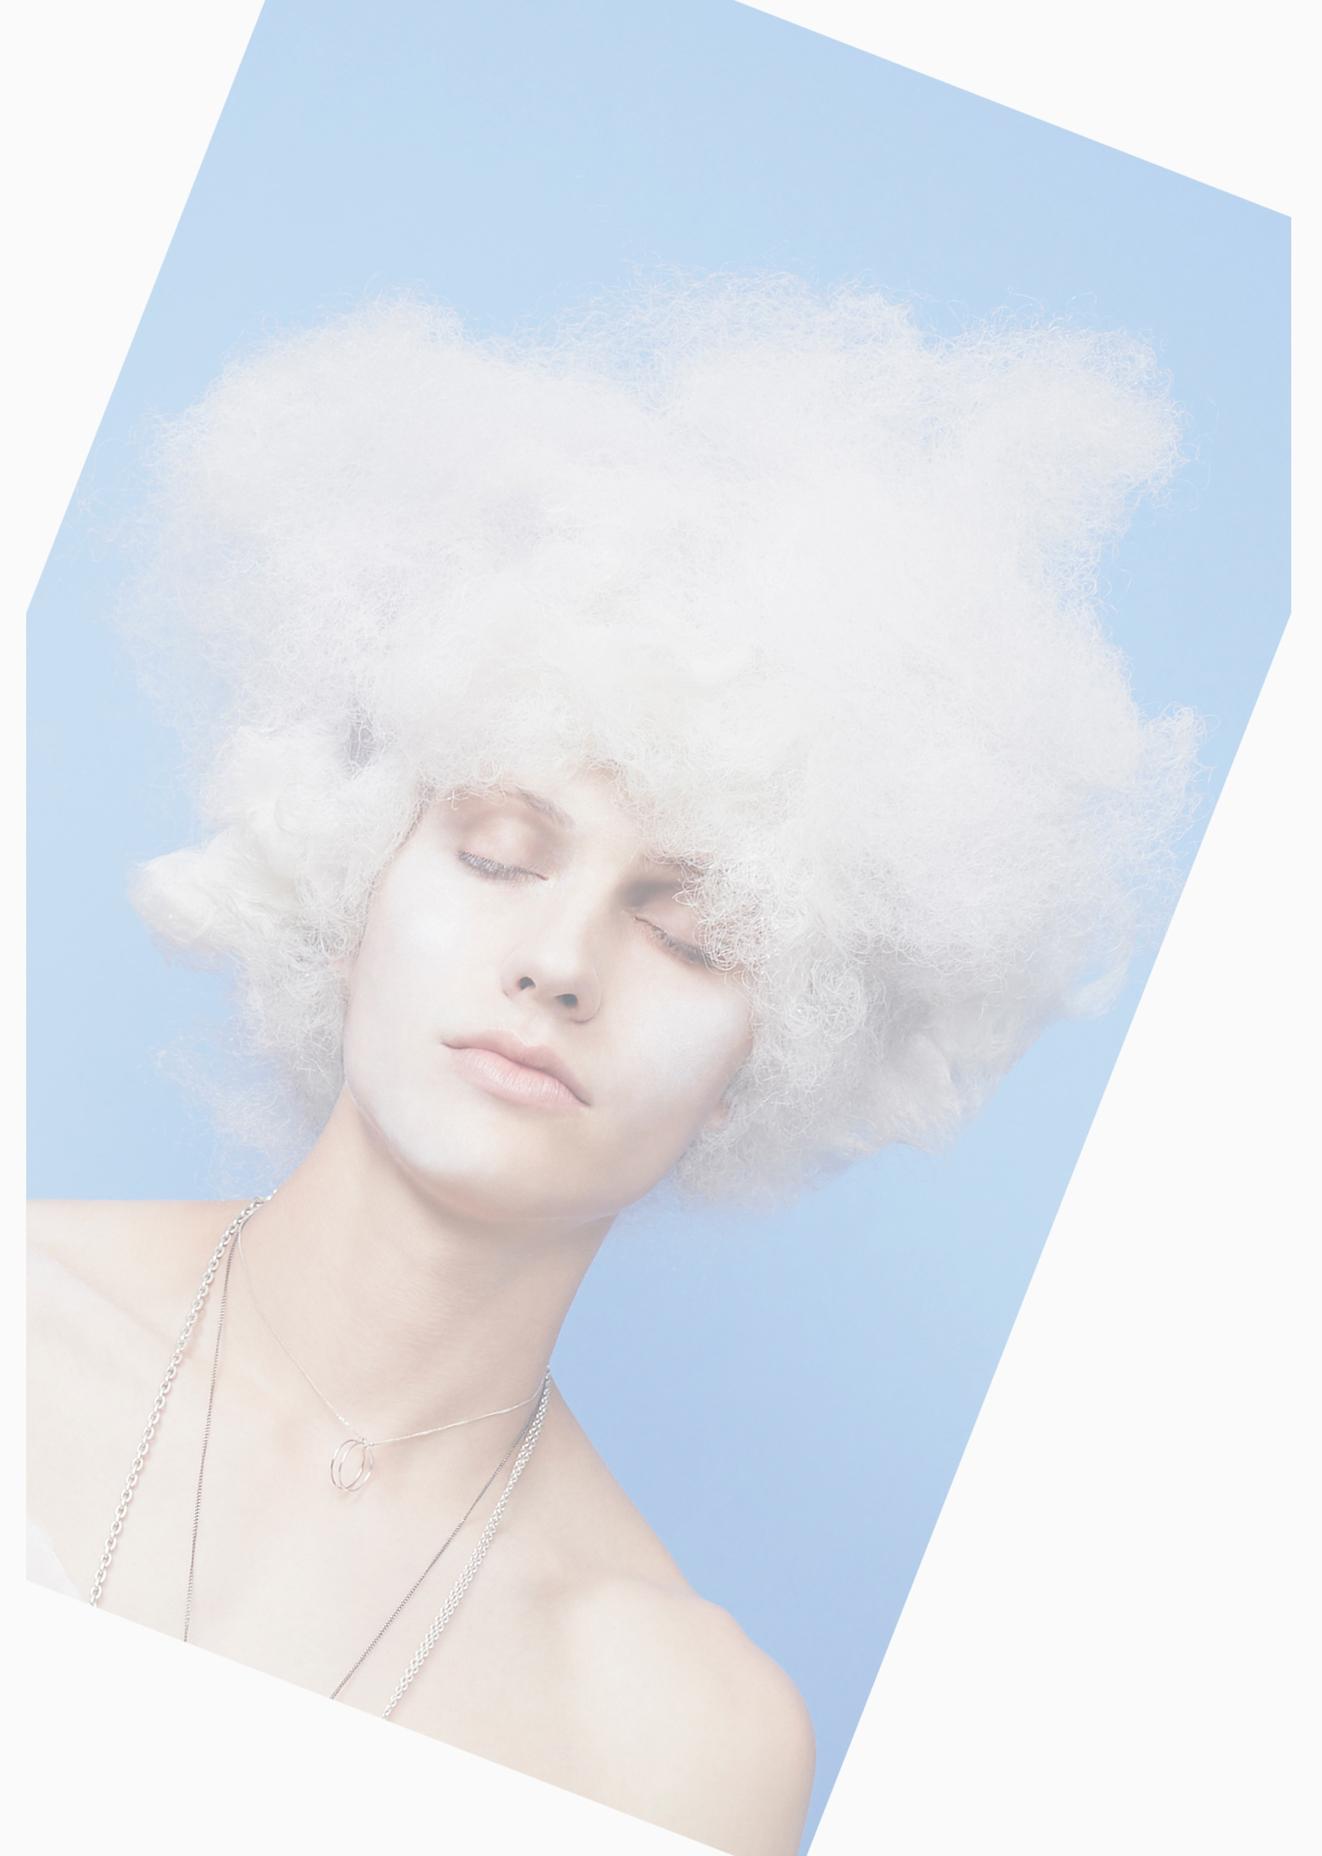 Atkinson_Creem_Cloud9_Spread_8_Web_NT_SINGLE.jpg